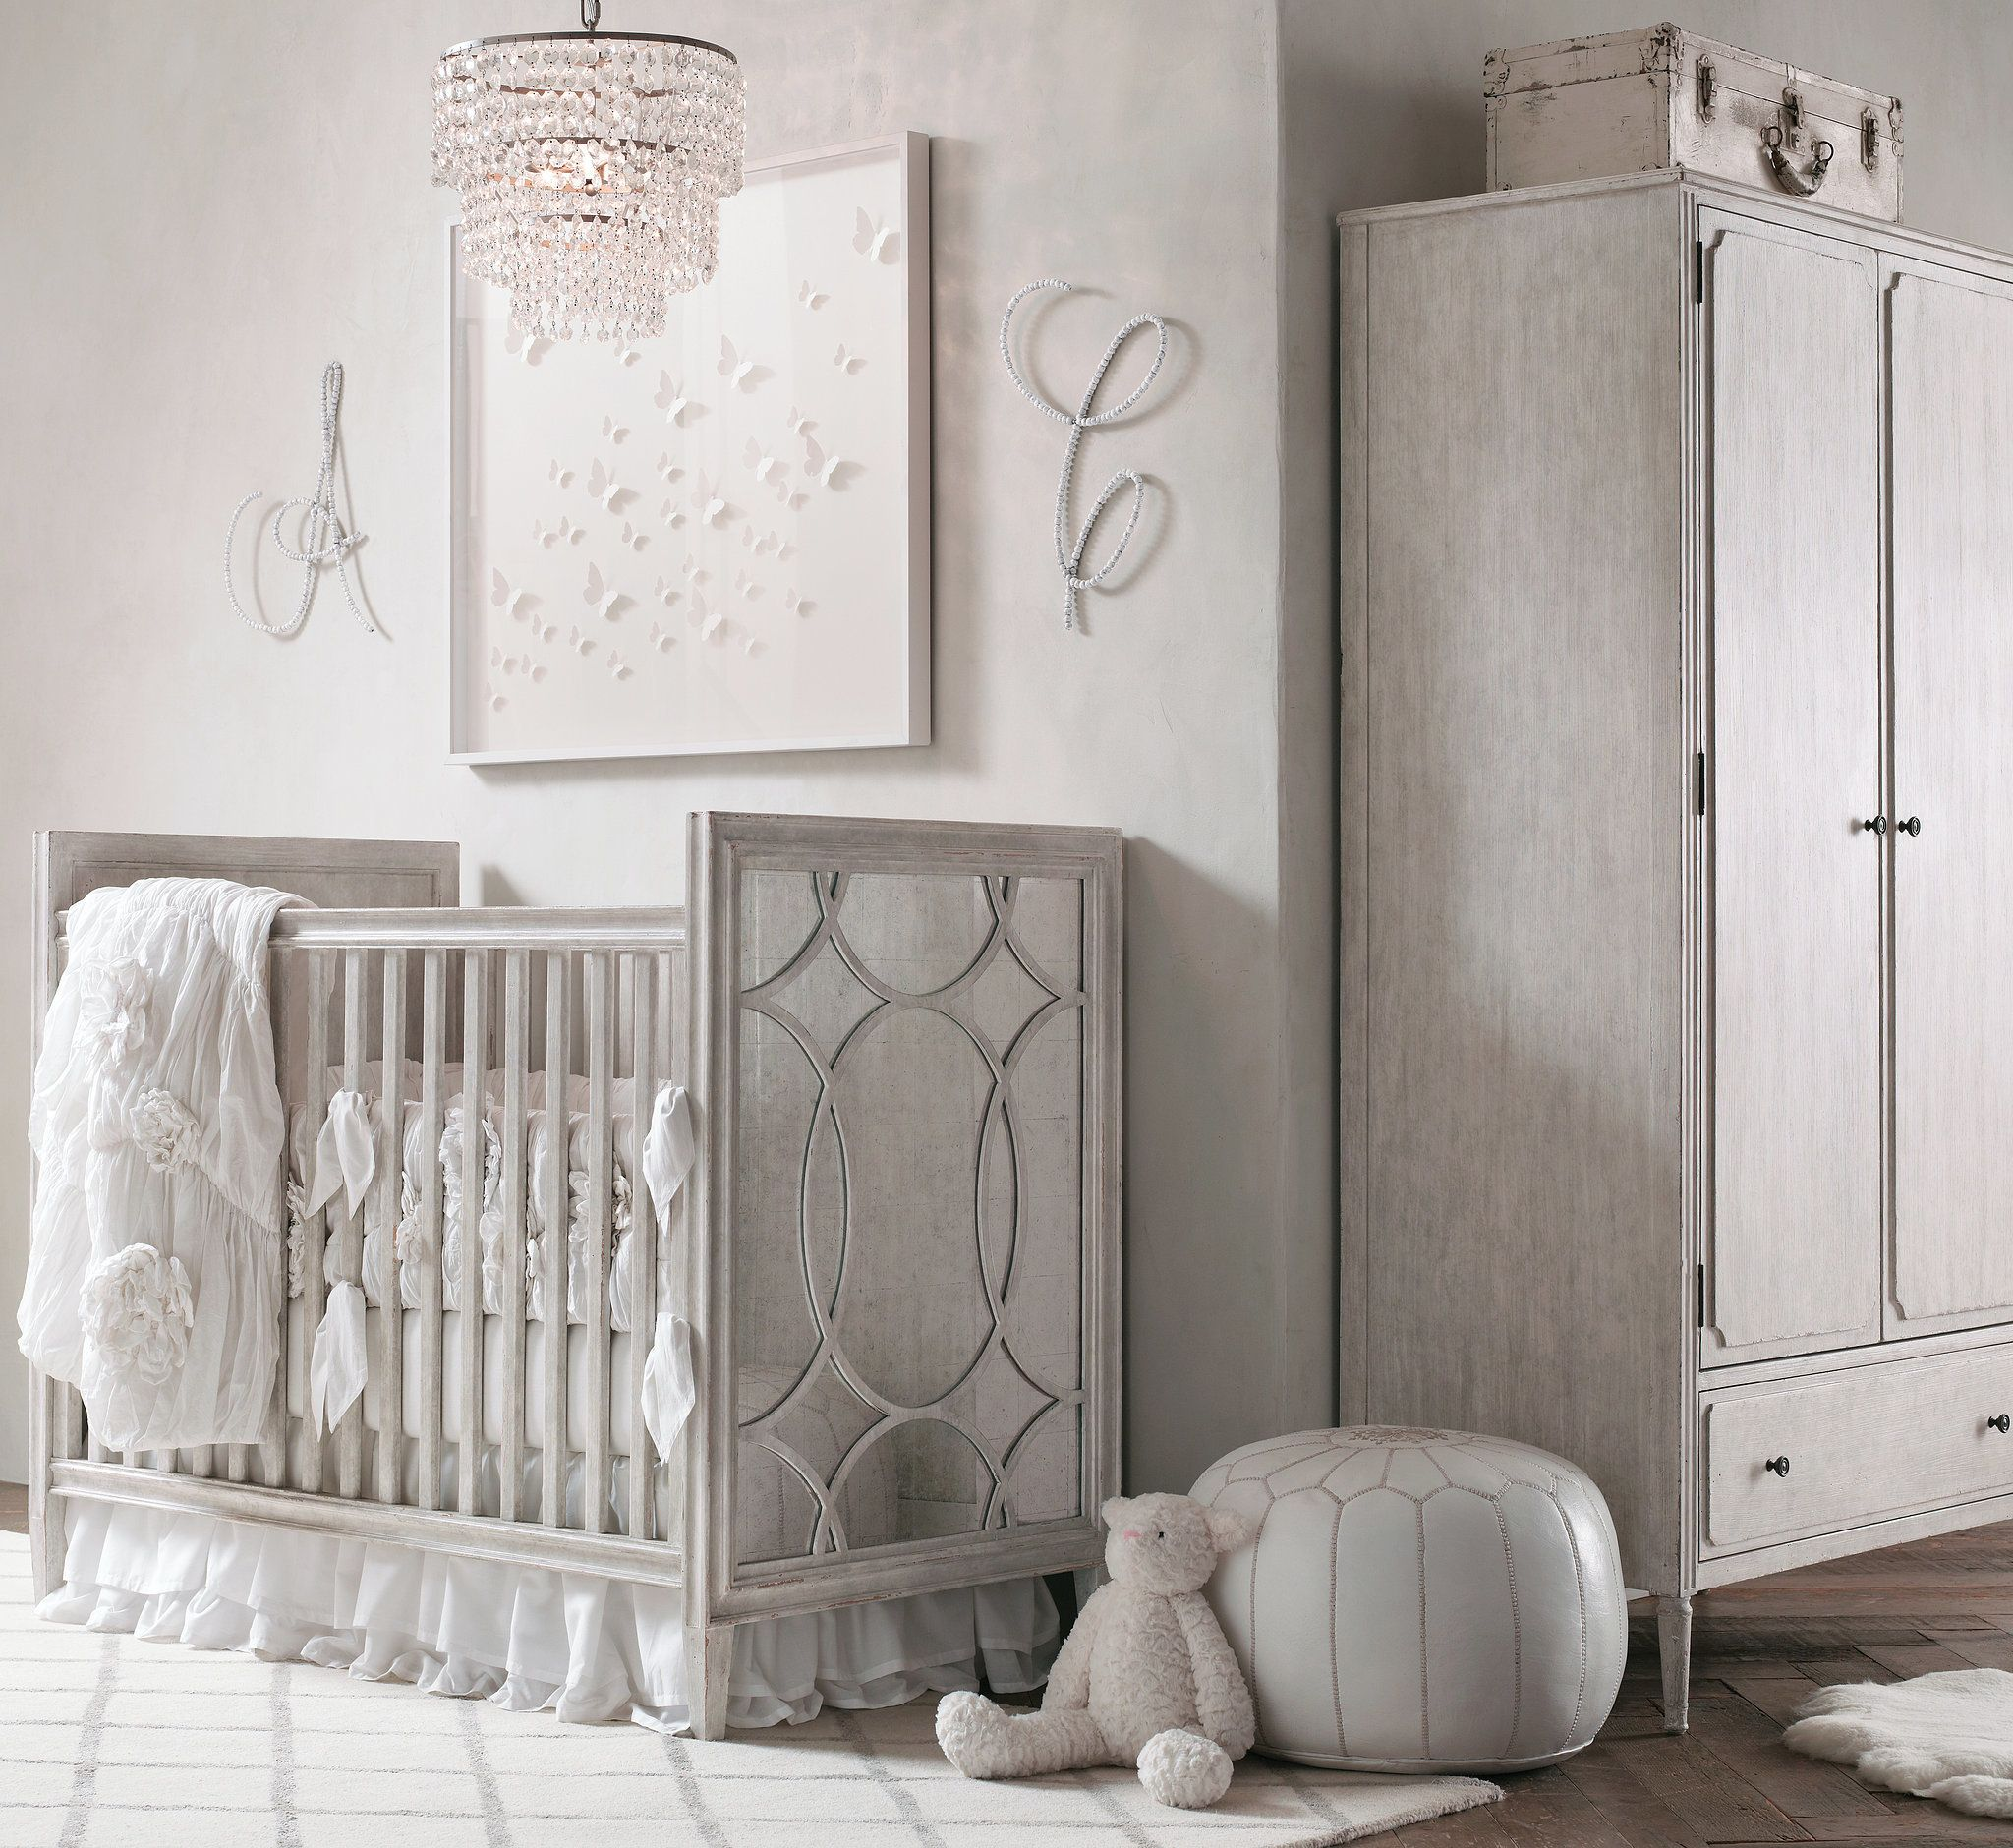 A Soft Glamorous Nursery For a Baby Girl Soho Nursery and Babies